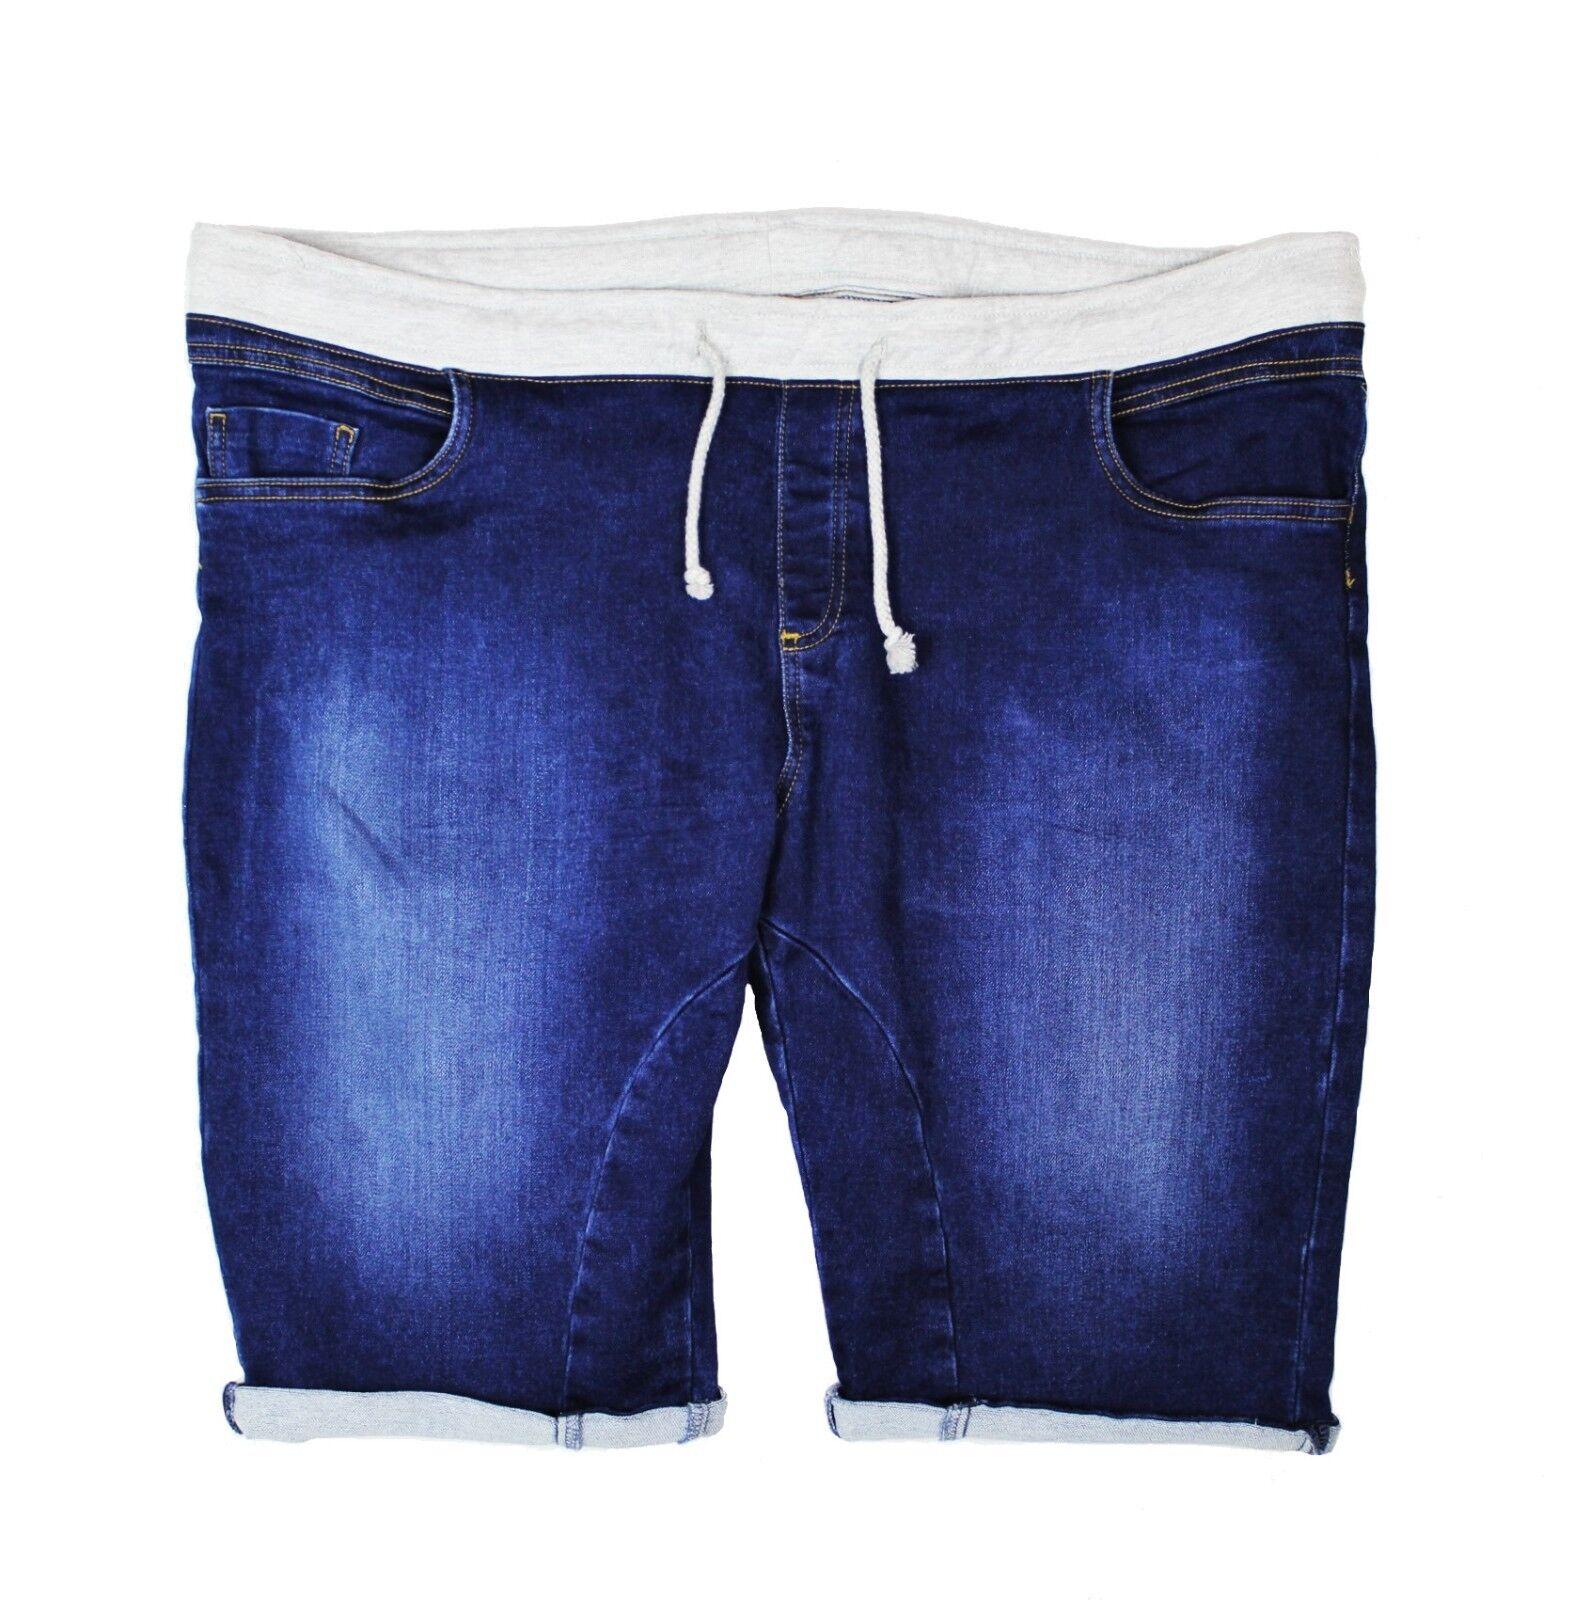 8fb1b6efac9a Neu identic Herren Jeans Stretch Shorts   kurze Hose - Gr. 44, 46 ...